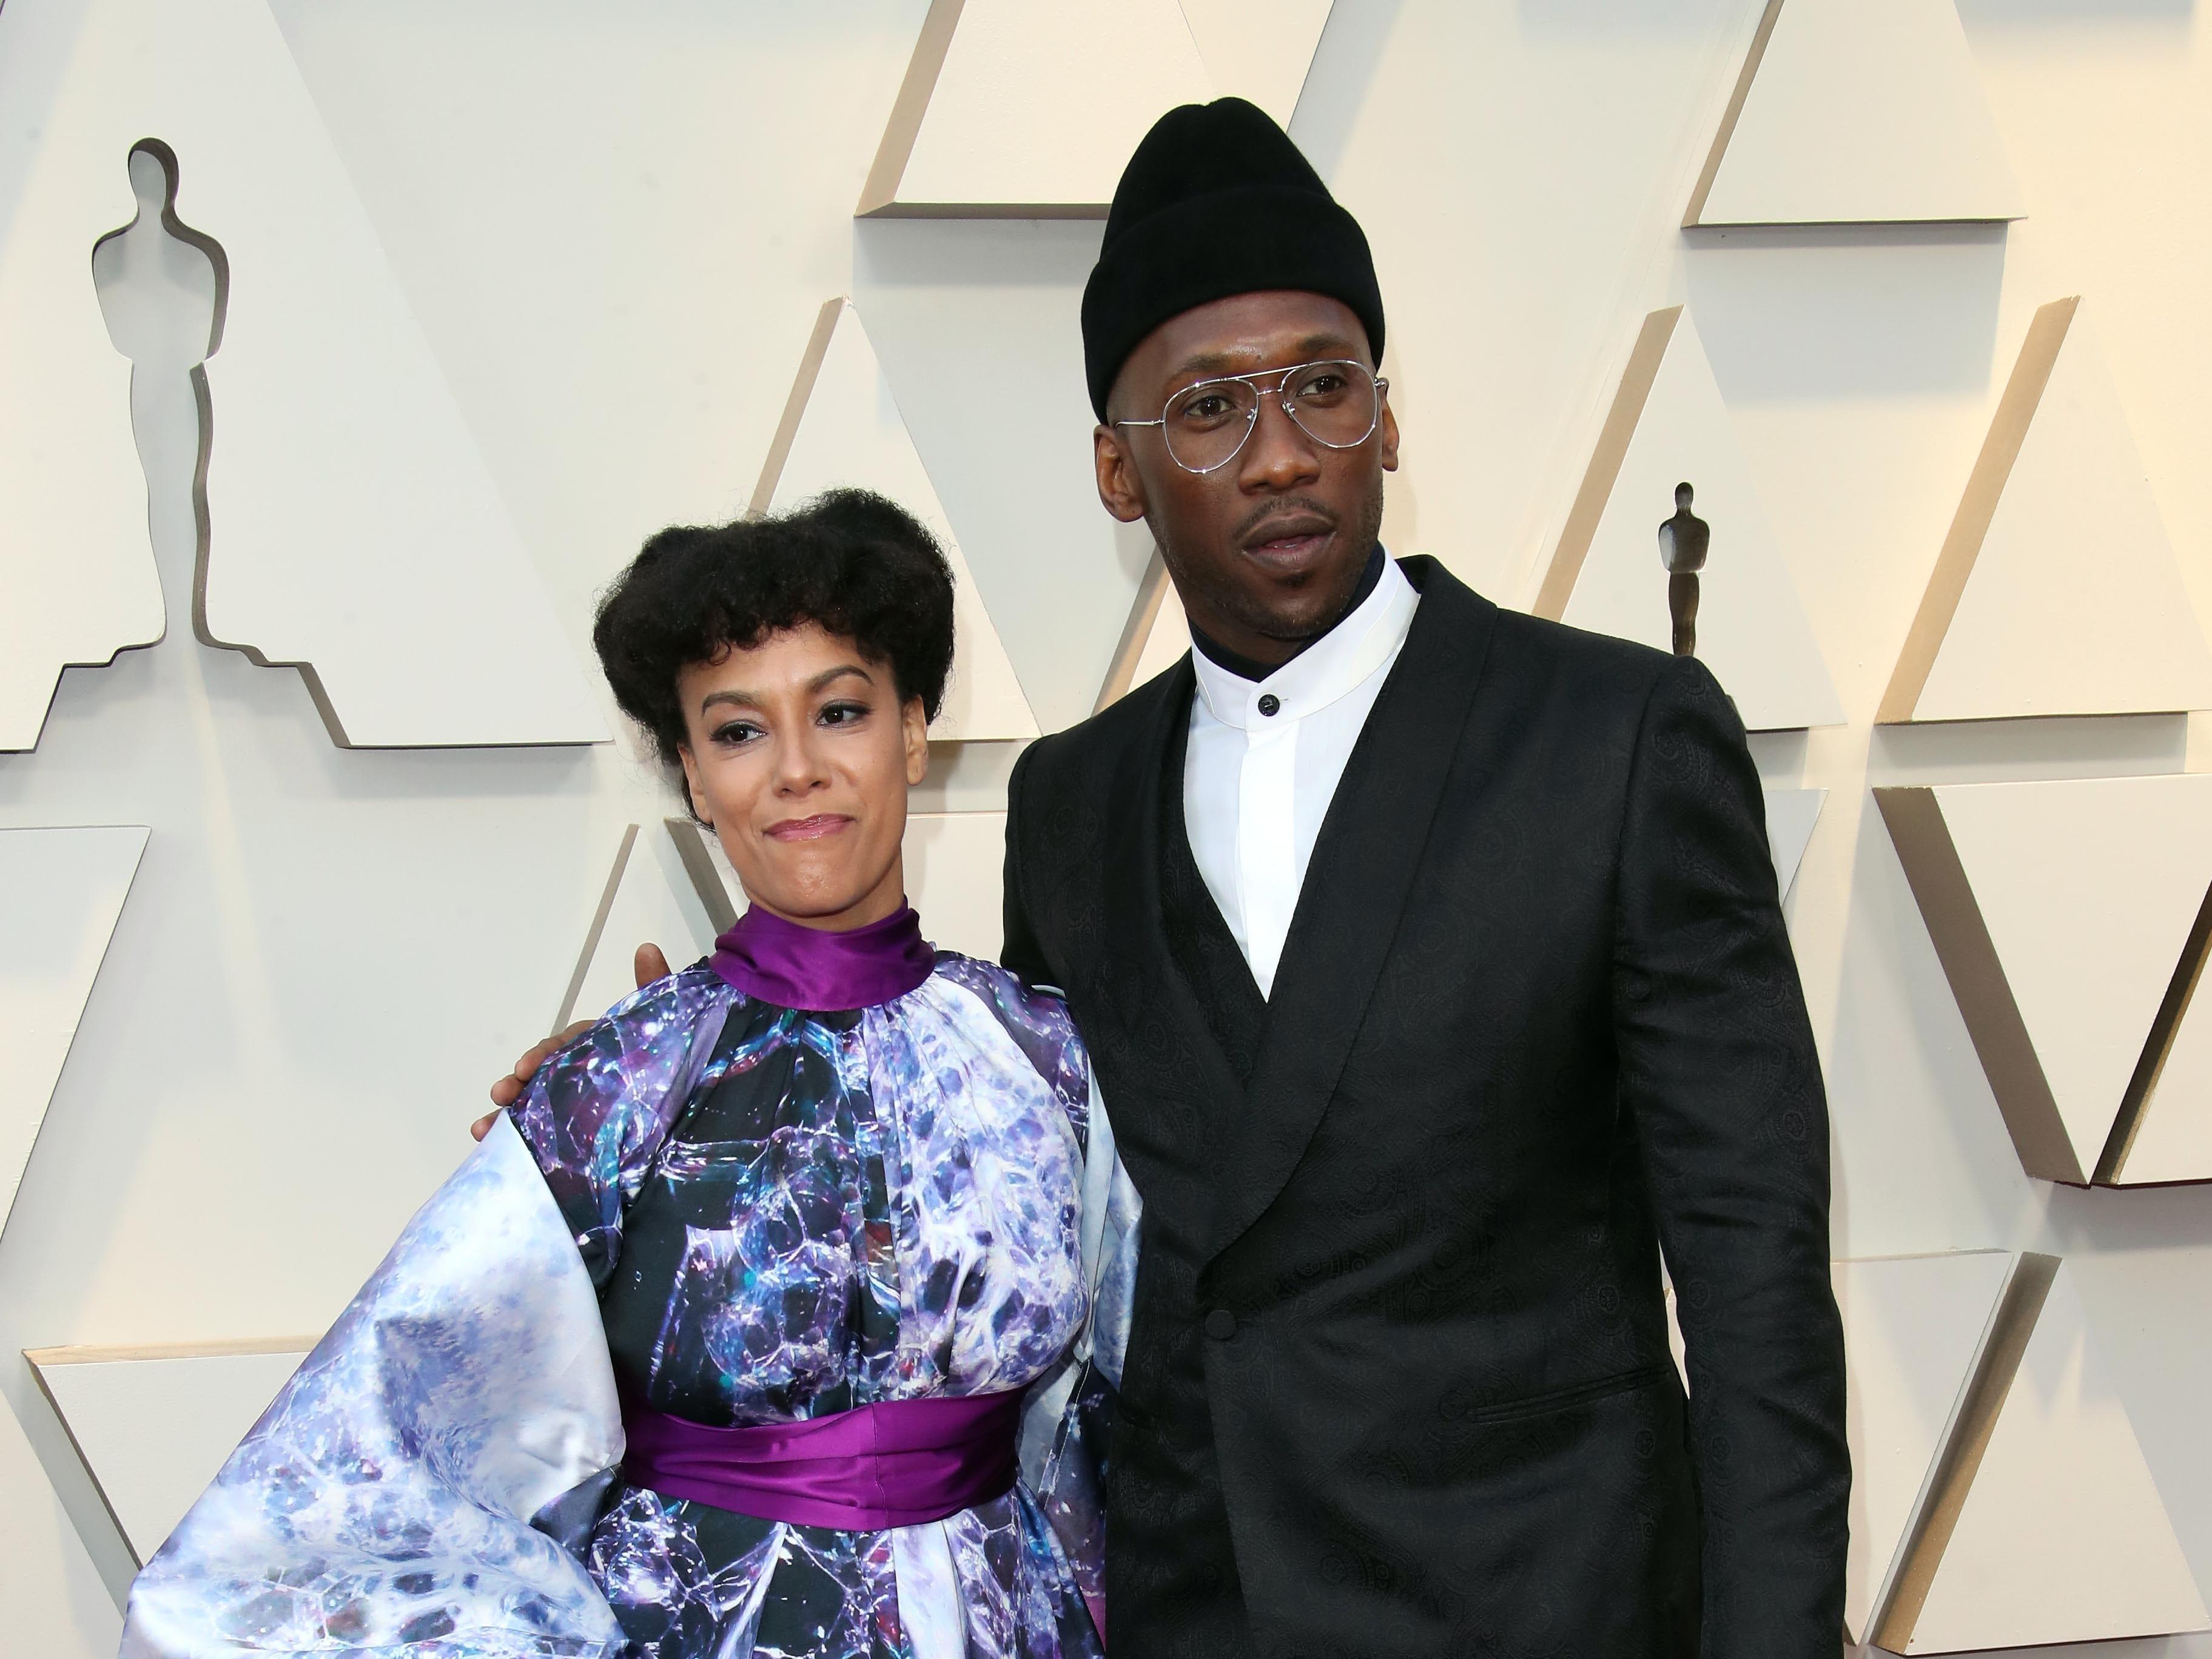 February 24, 2019; Los Angeles, CA, USA; Amatus Sami-Karim, left and Mahershala Ali arrive at the 91st Academy Awards at the Dolby Theatre. Mandatory Credit: Dan MacMedan-USA TODAY NETWORK